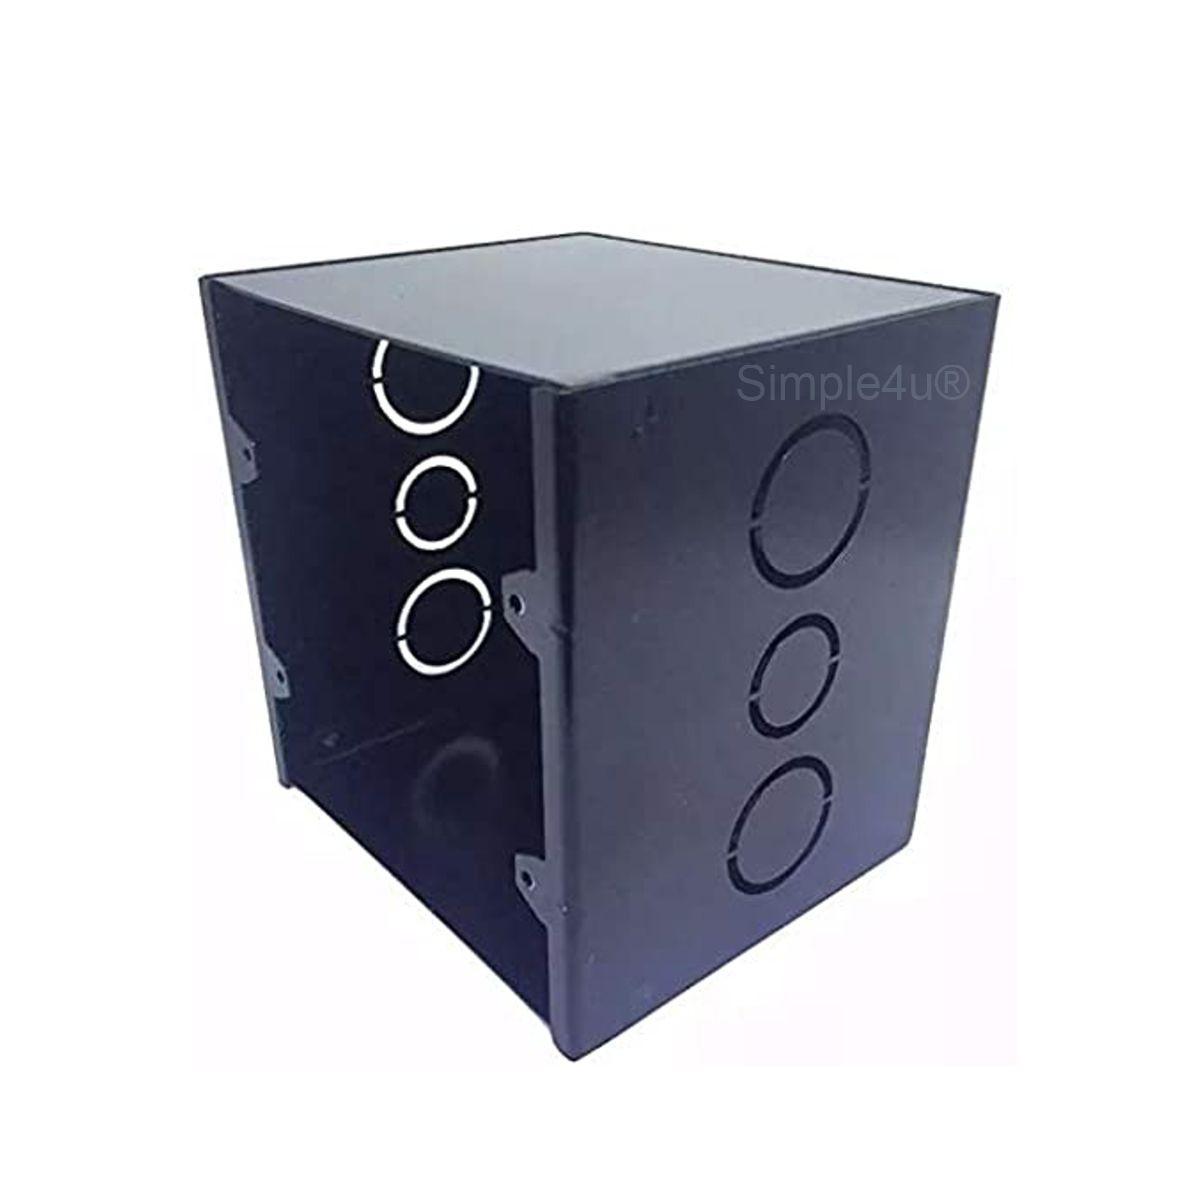 Kit Amplificador de Parede Bluetooth LAC NG + 4 Caixas Acústicas de Embutir SQ6-60 BL Loud